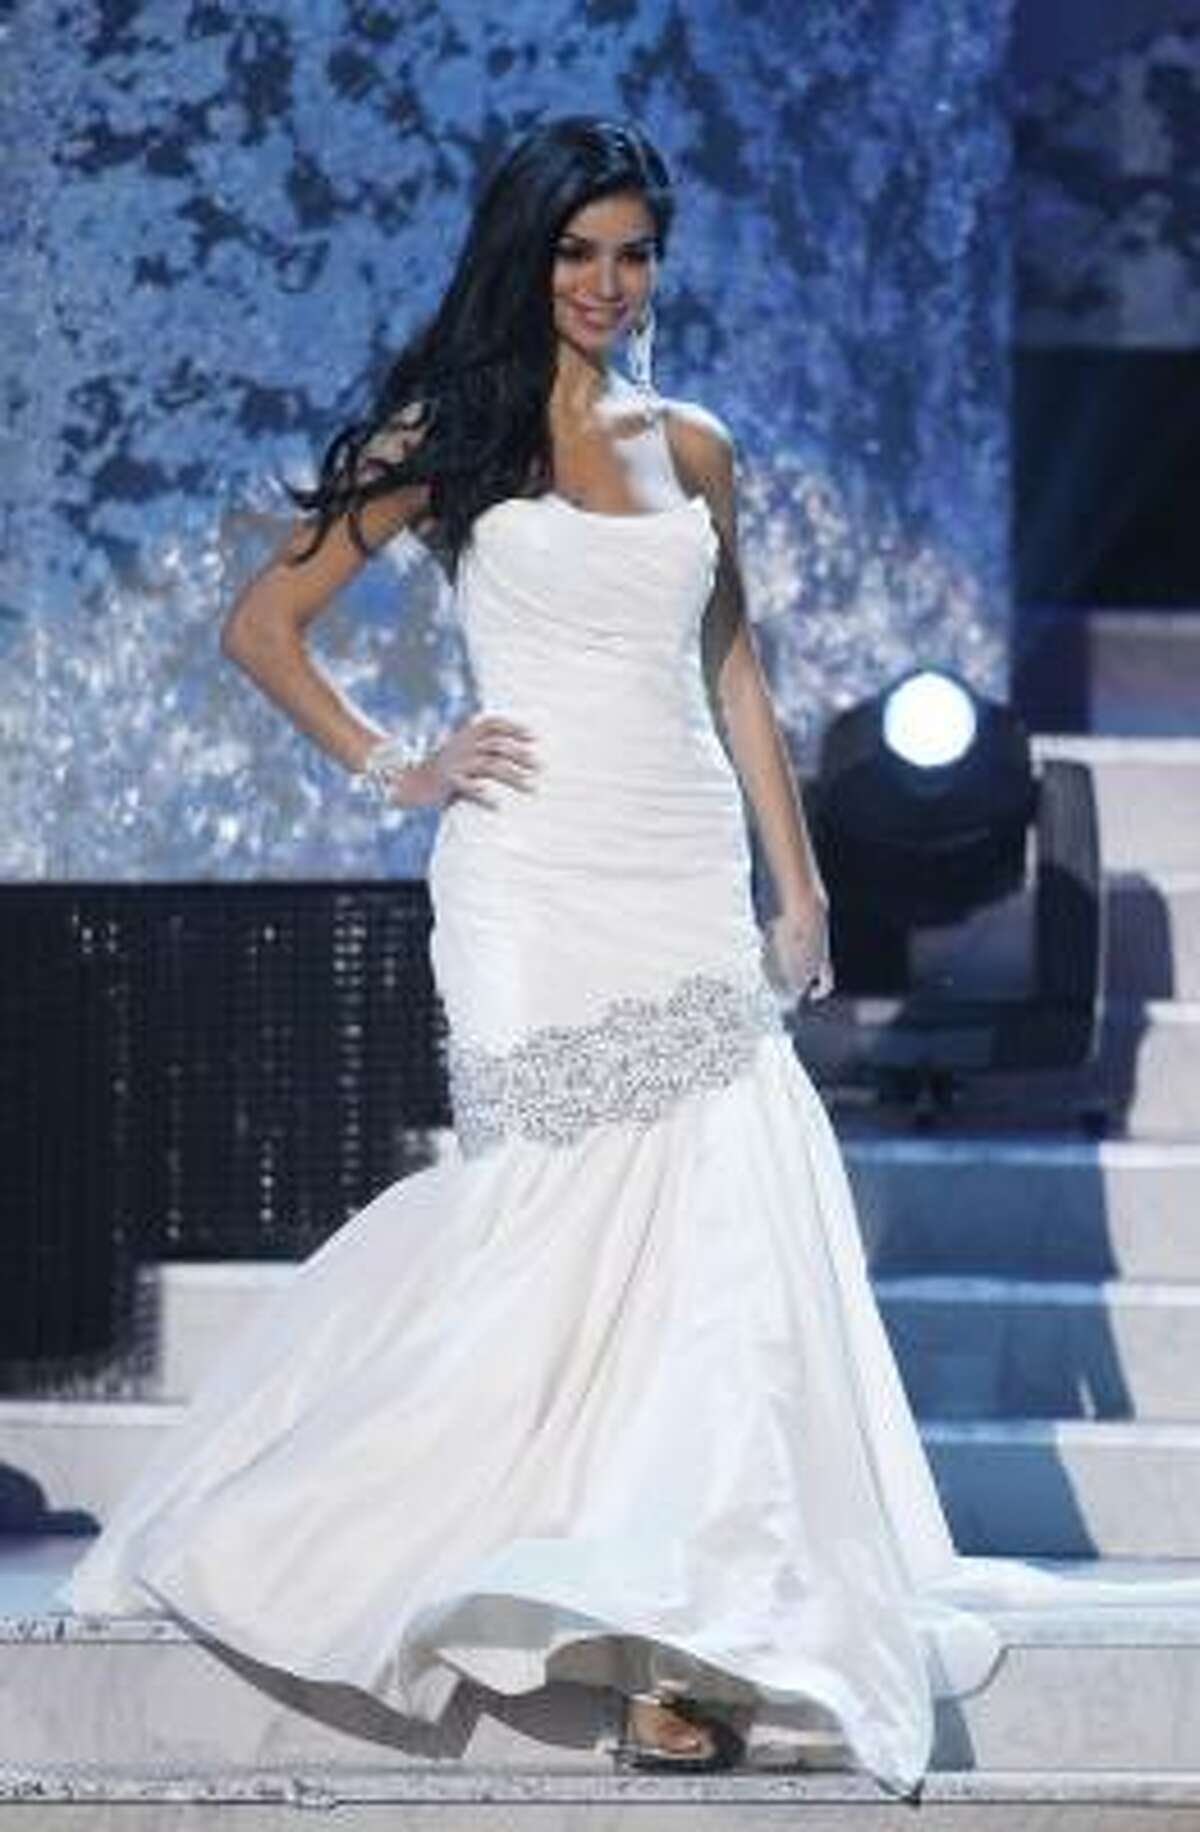 Miss USA, Rima Fakih